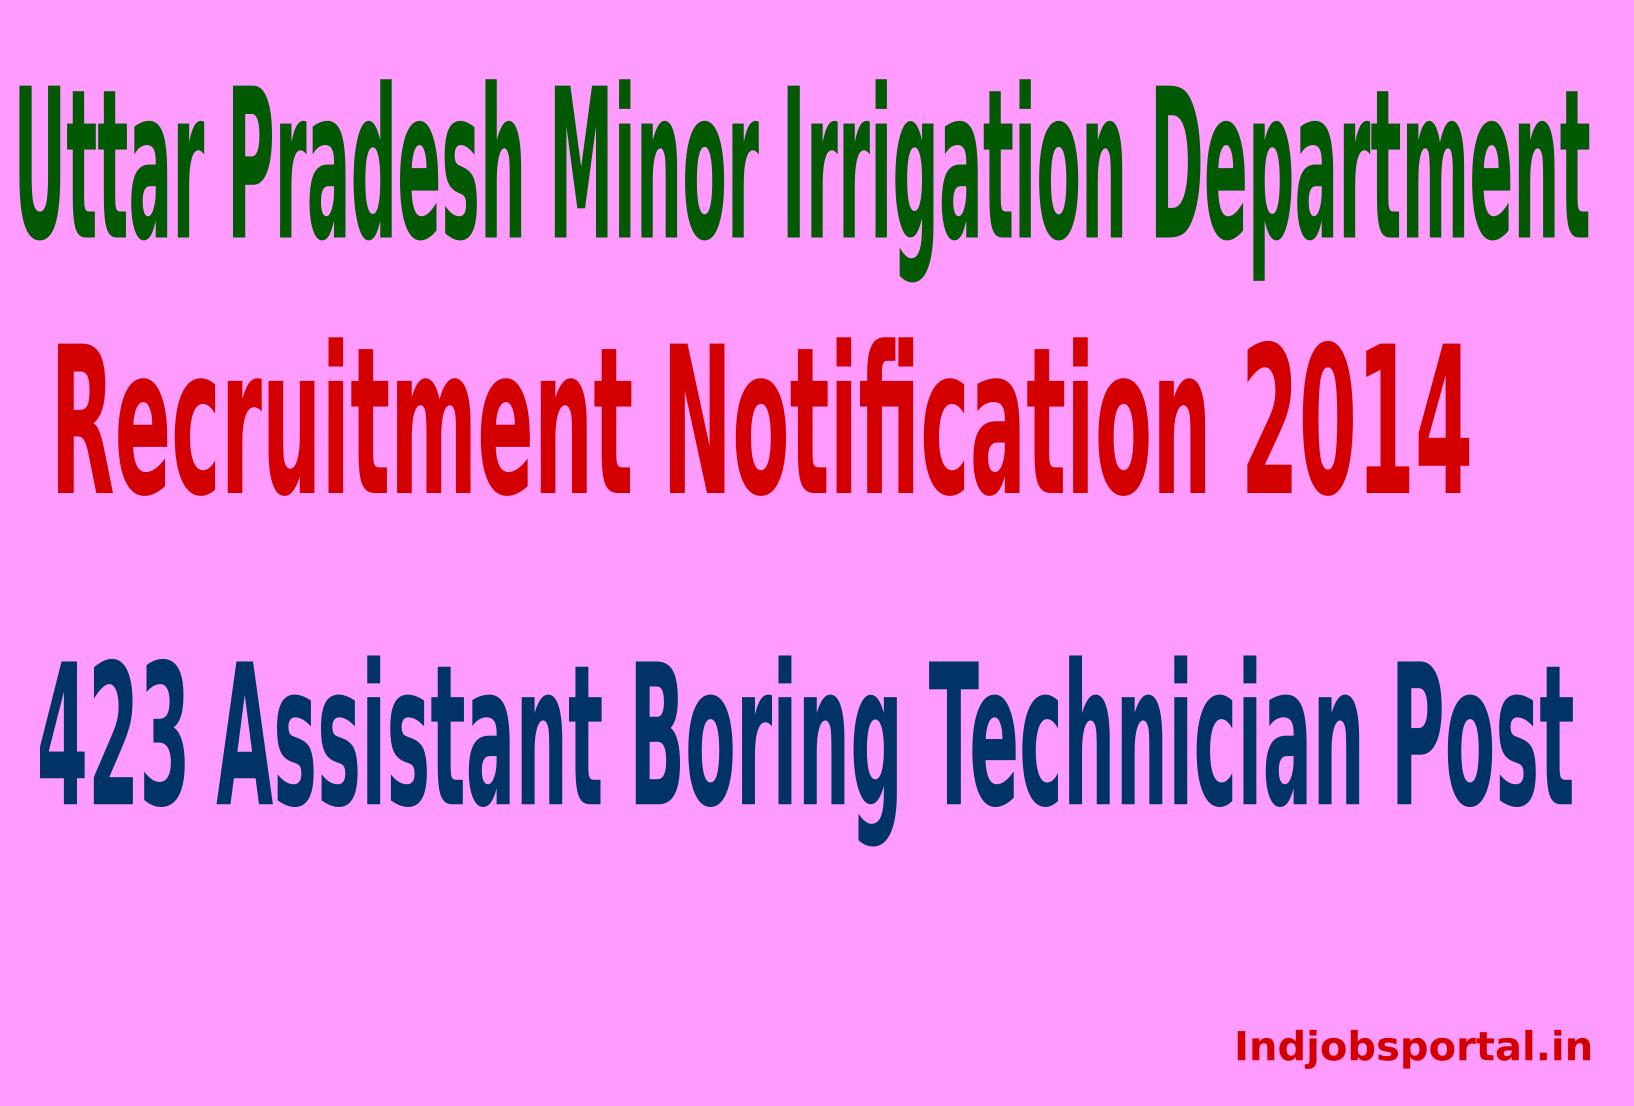 Minor Irrigation Department Recruitment 2014 For 423 Assistant Boring Technician Post